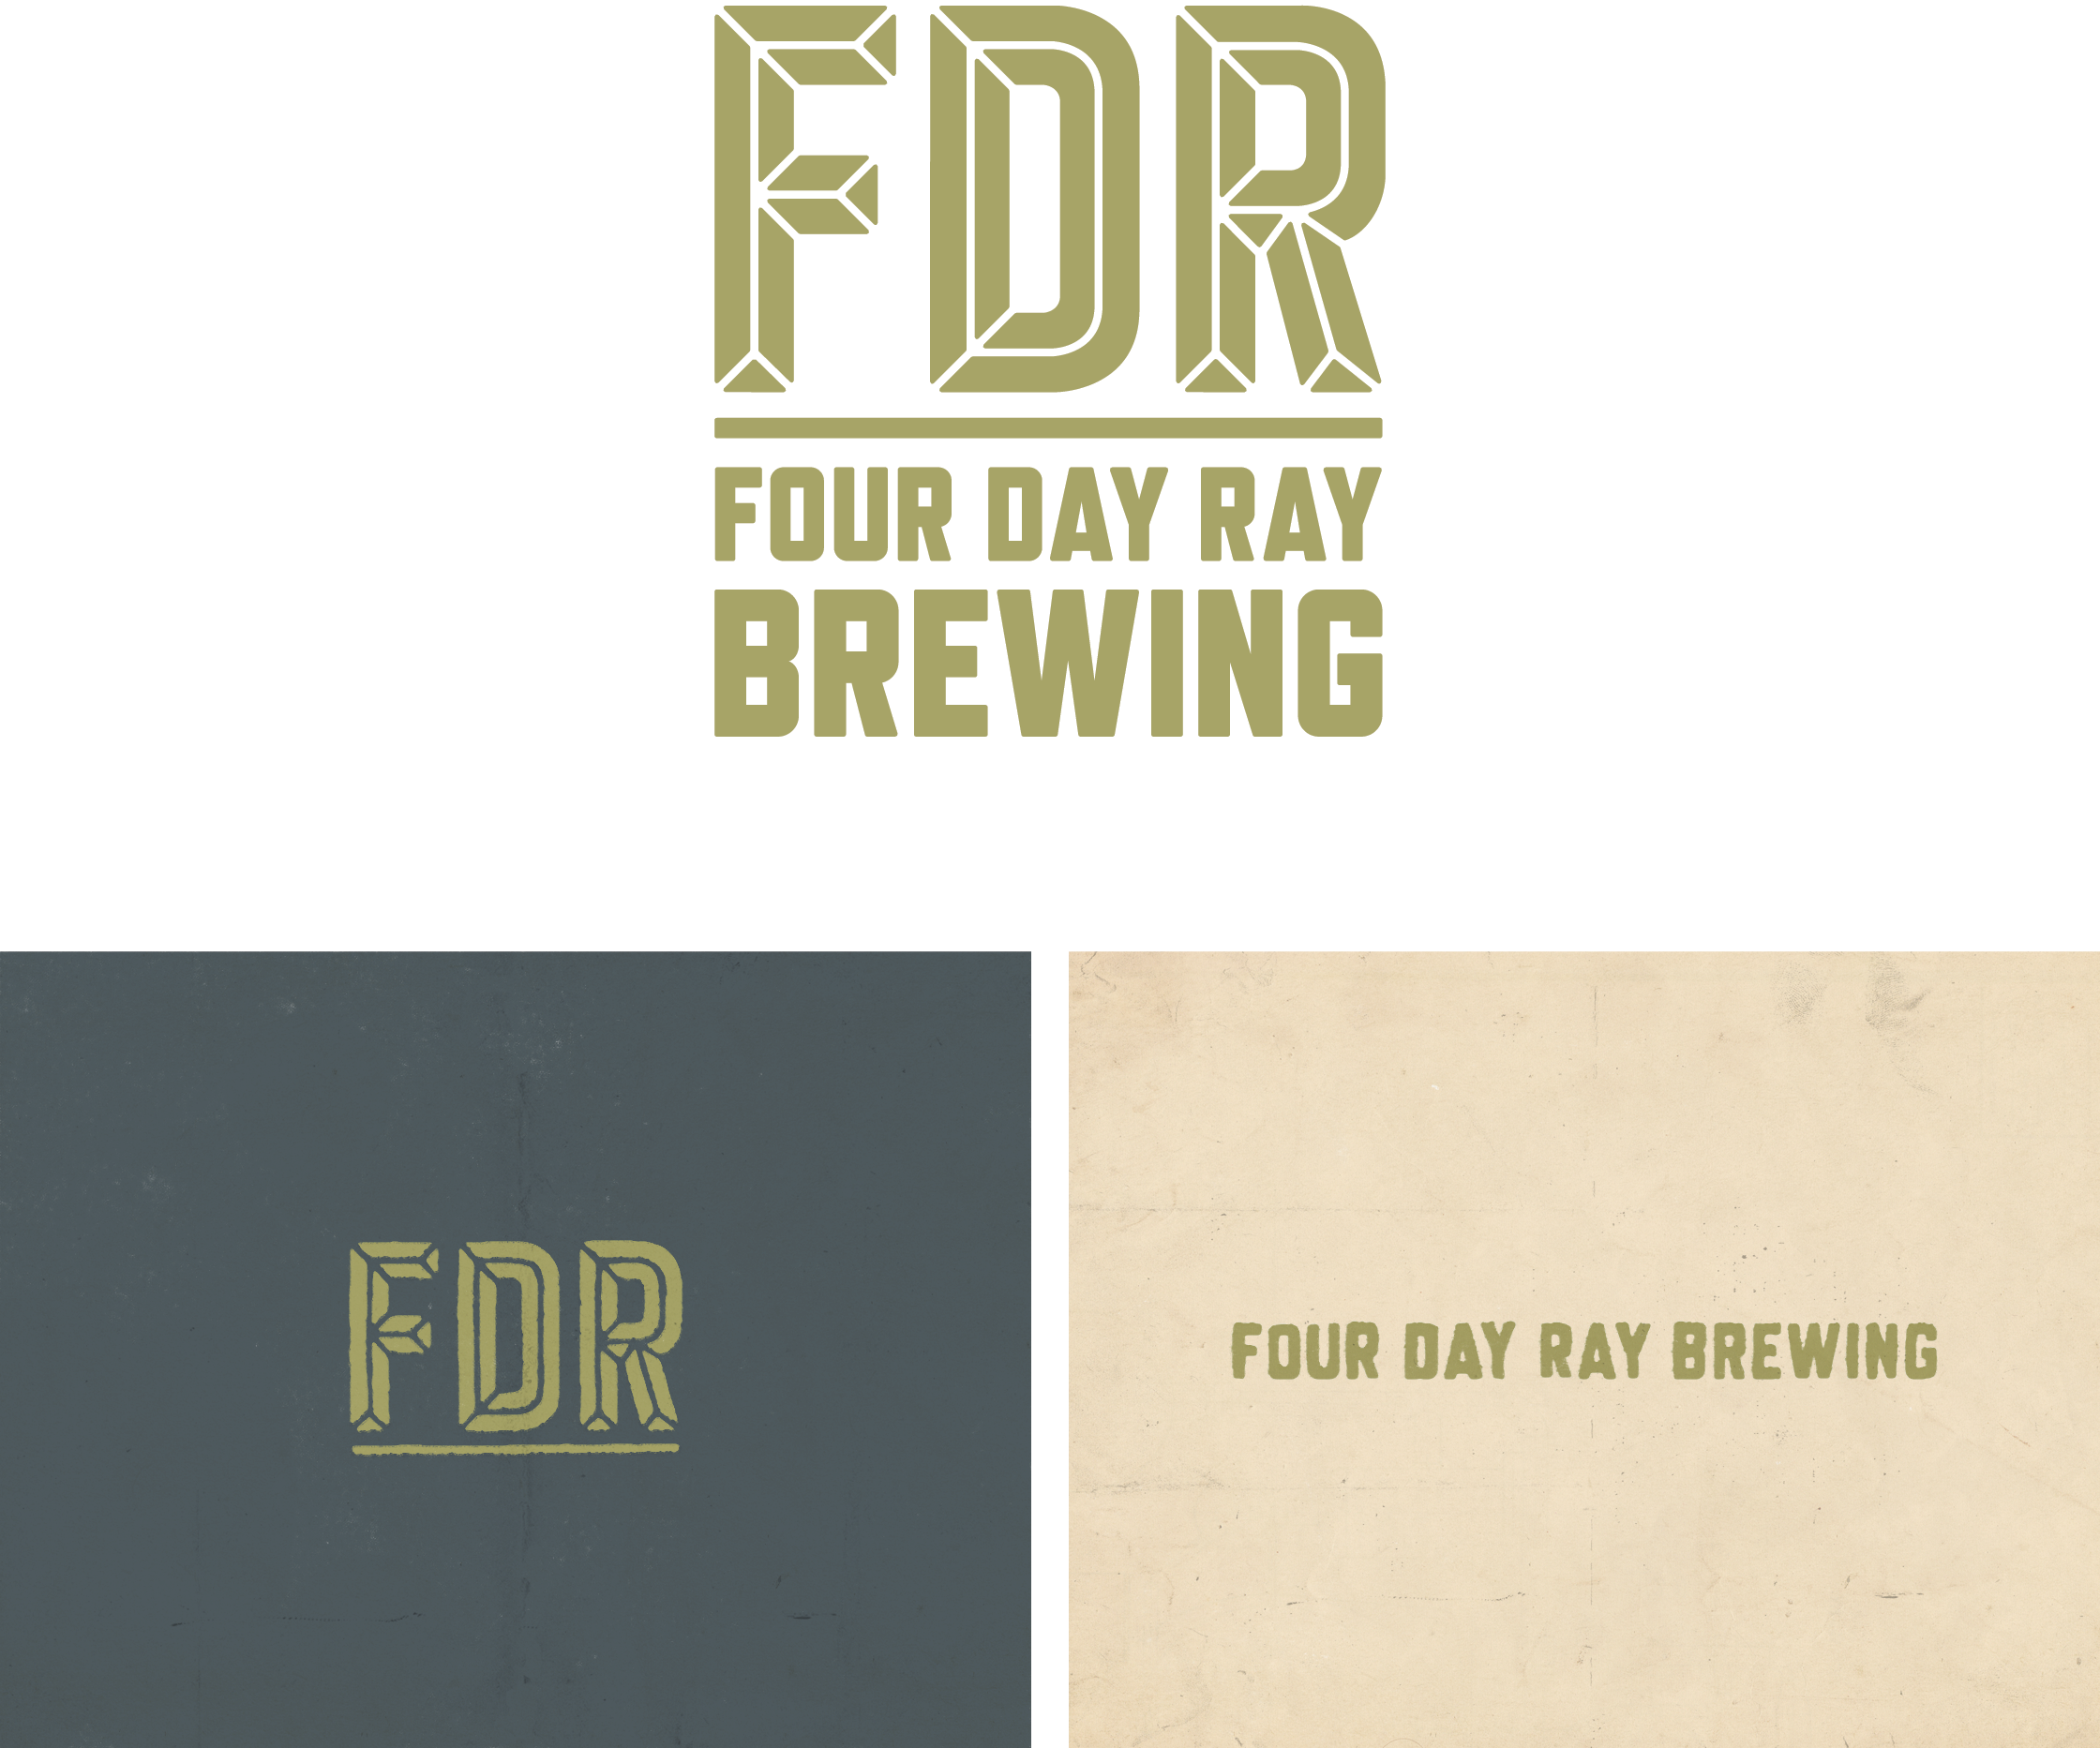 FDR Logos